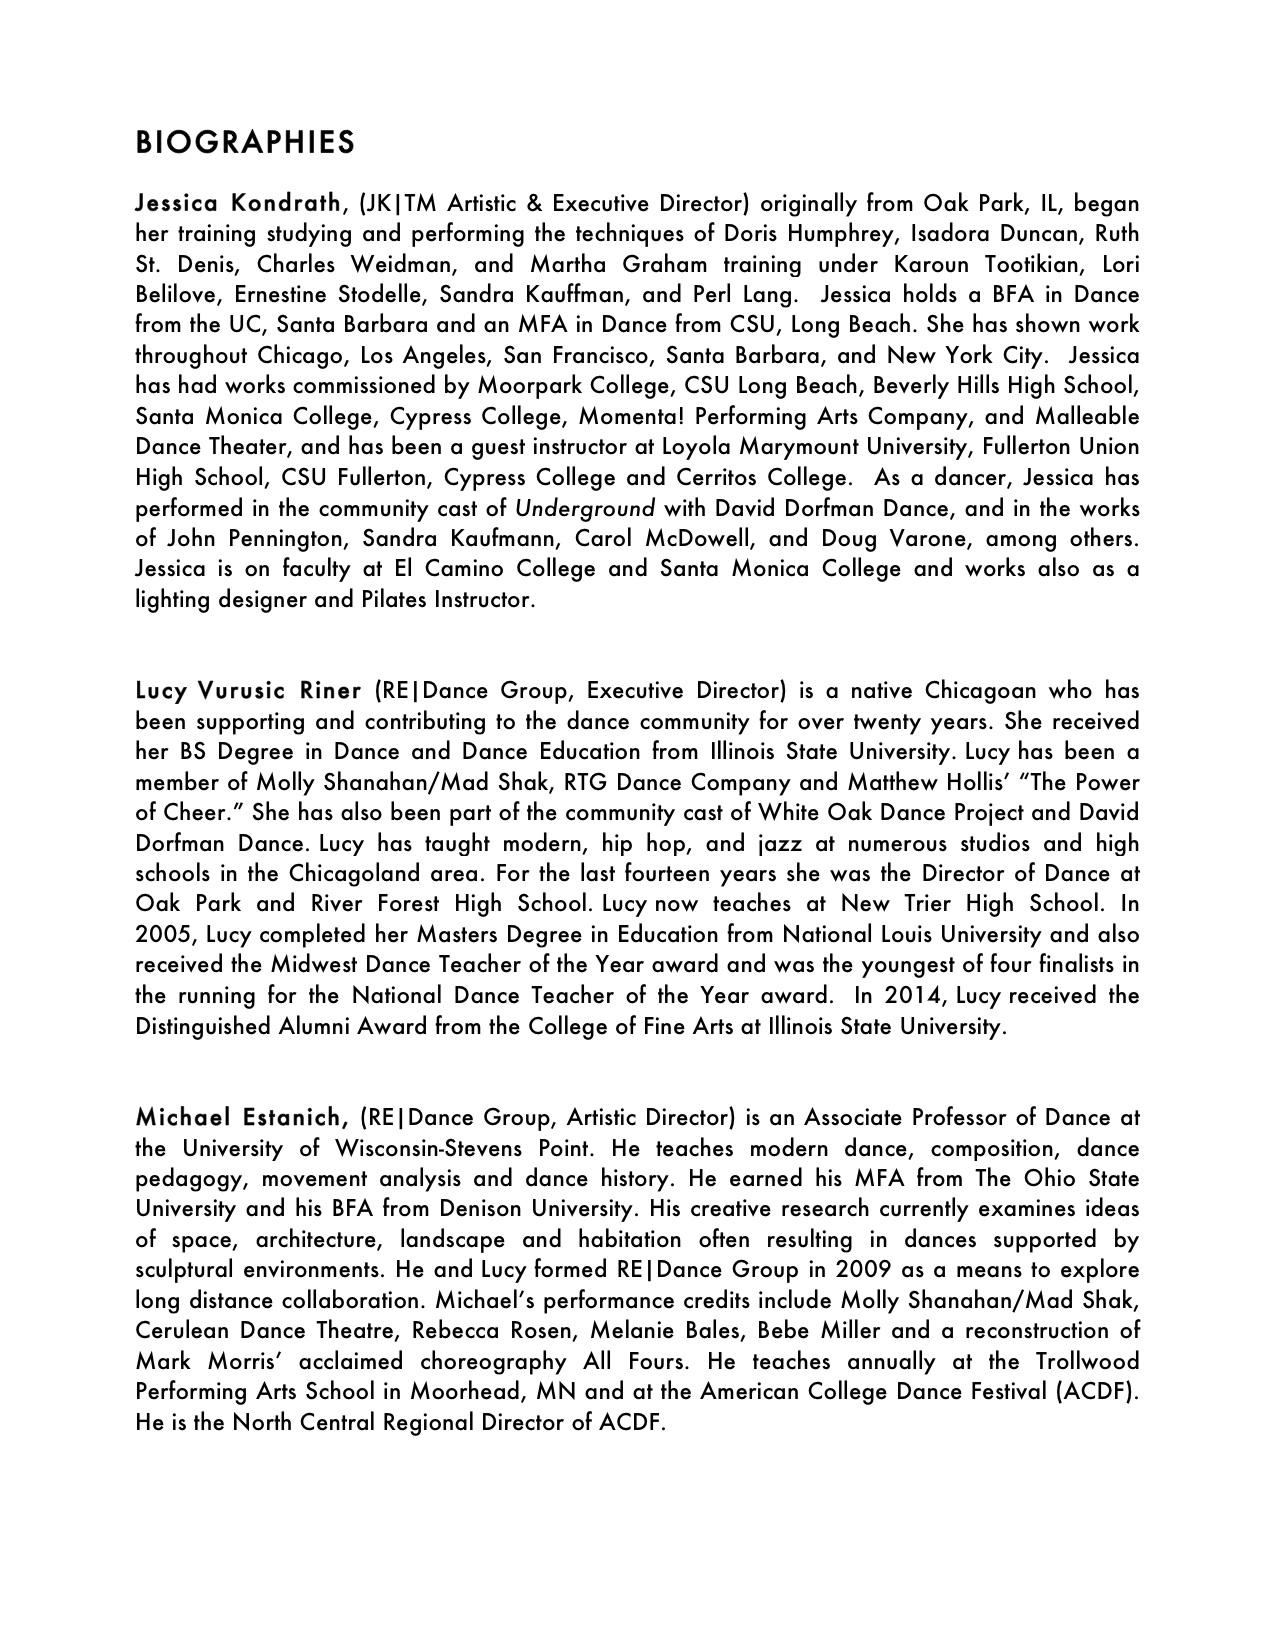 JKTM-RE_Dance Group master class description, bios.jpg